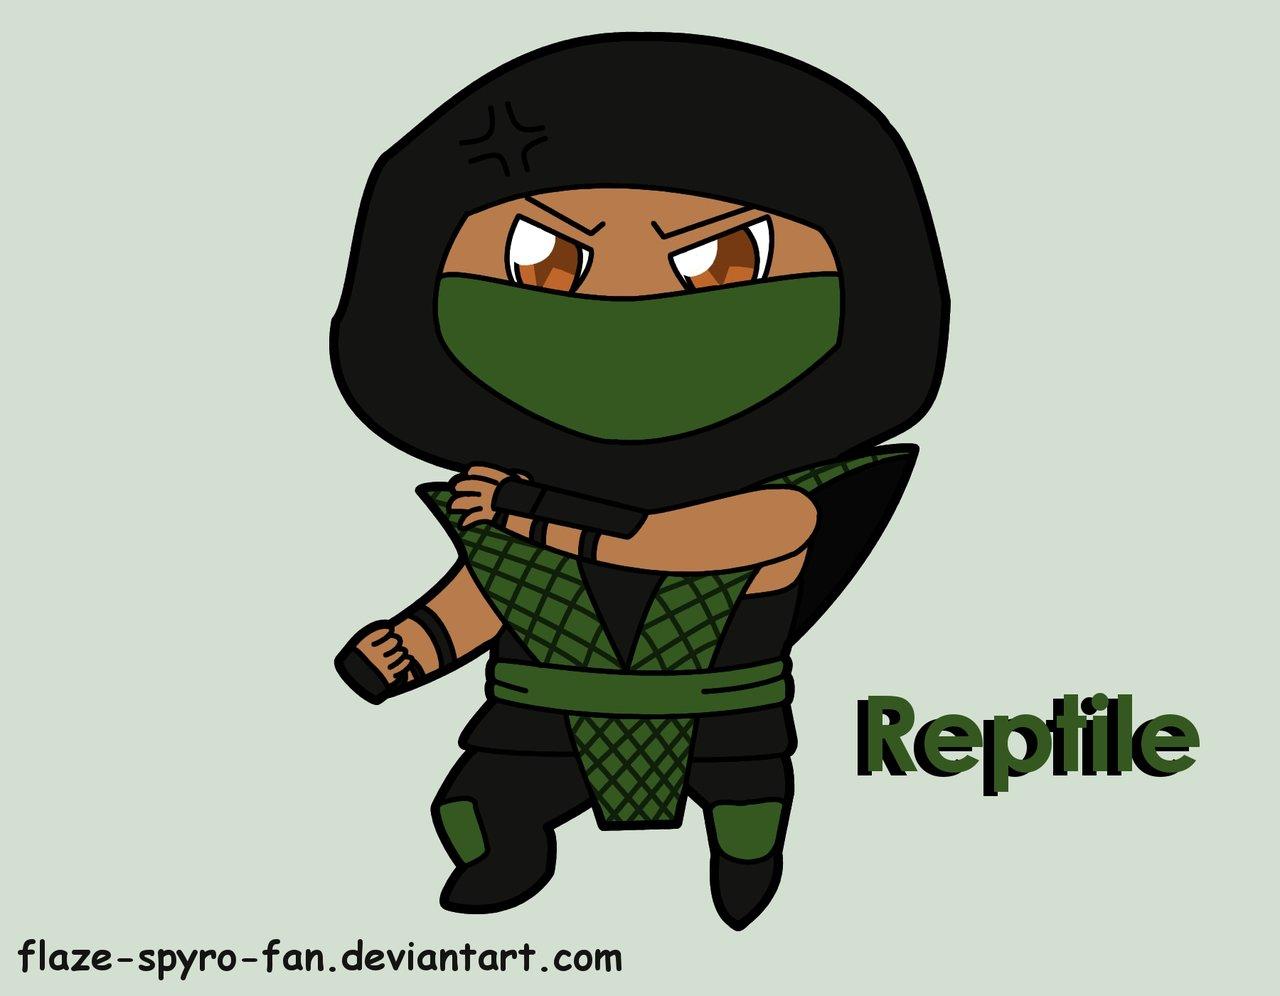 Drawn reptile chibi DeviantArt Reptile by on Crimson